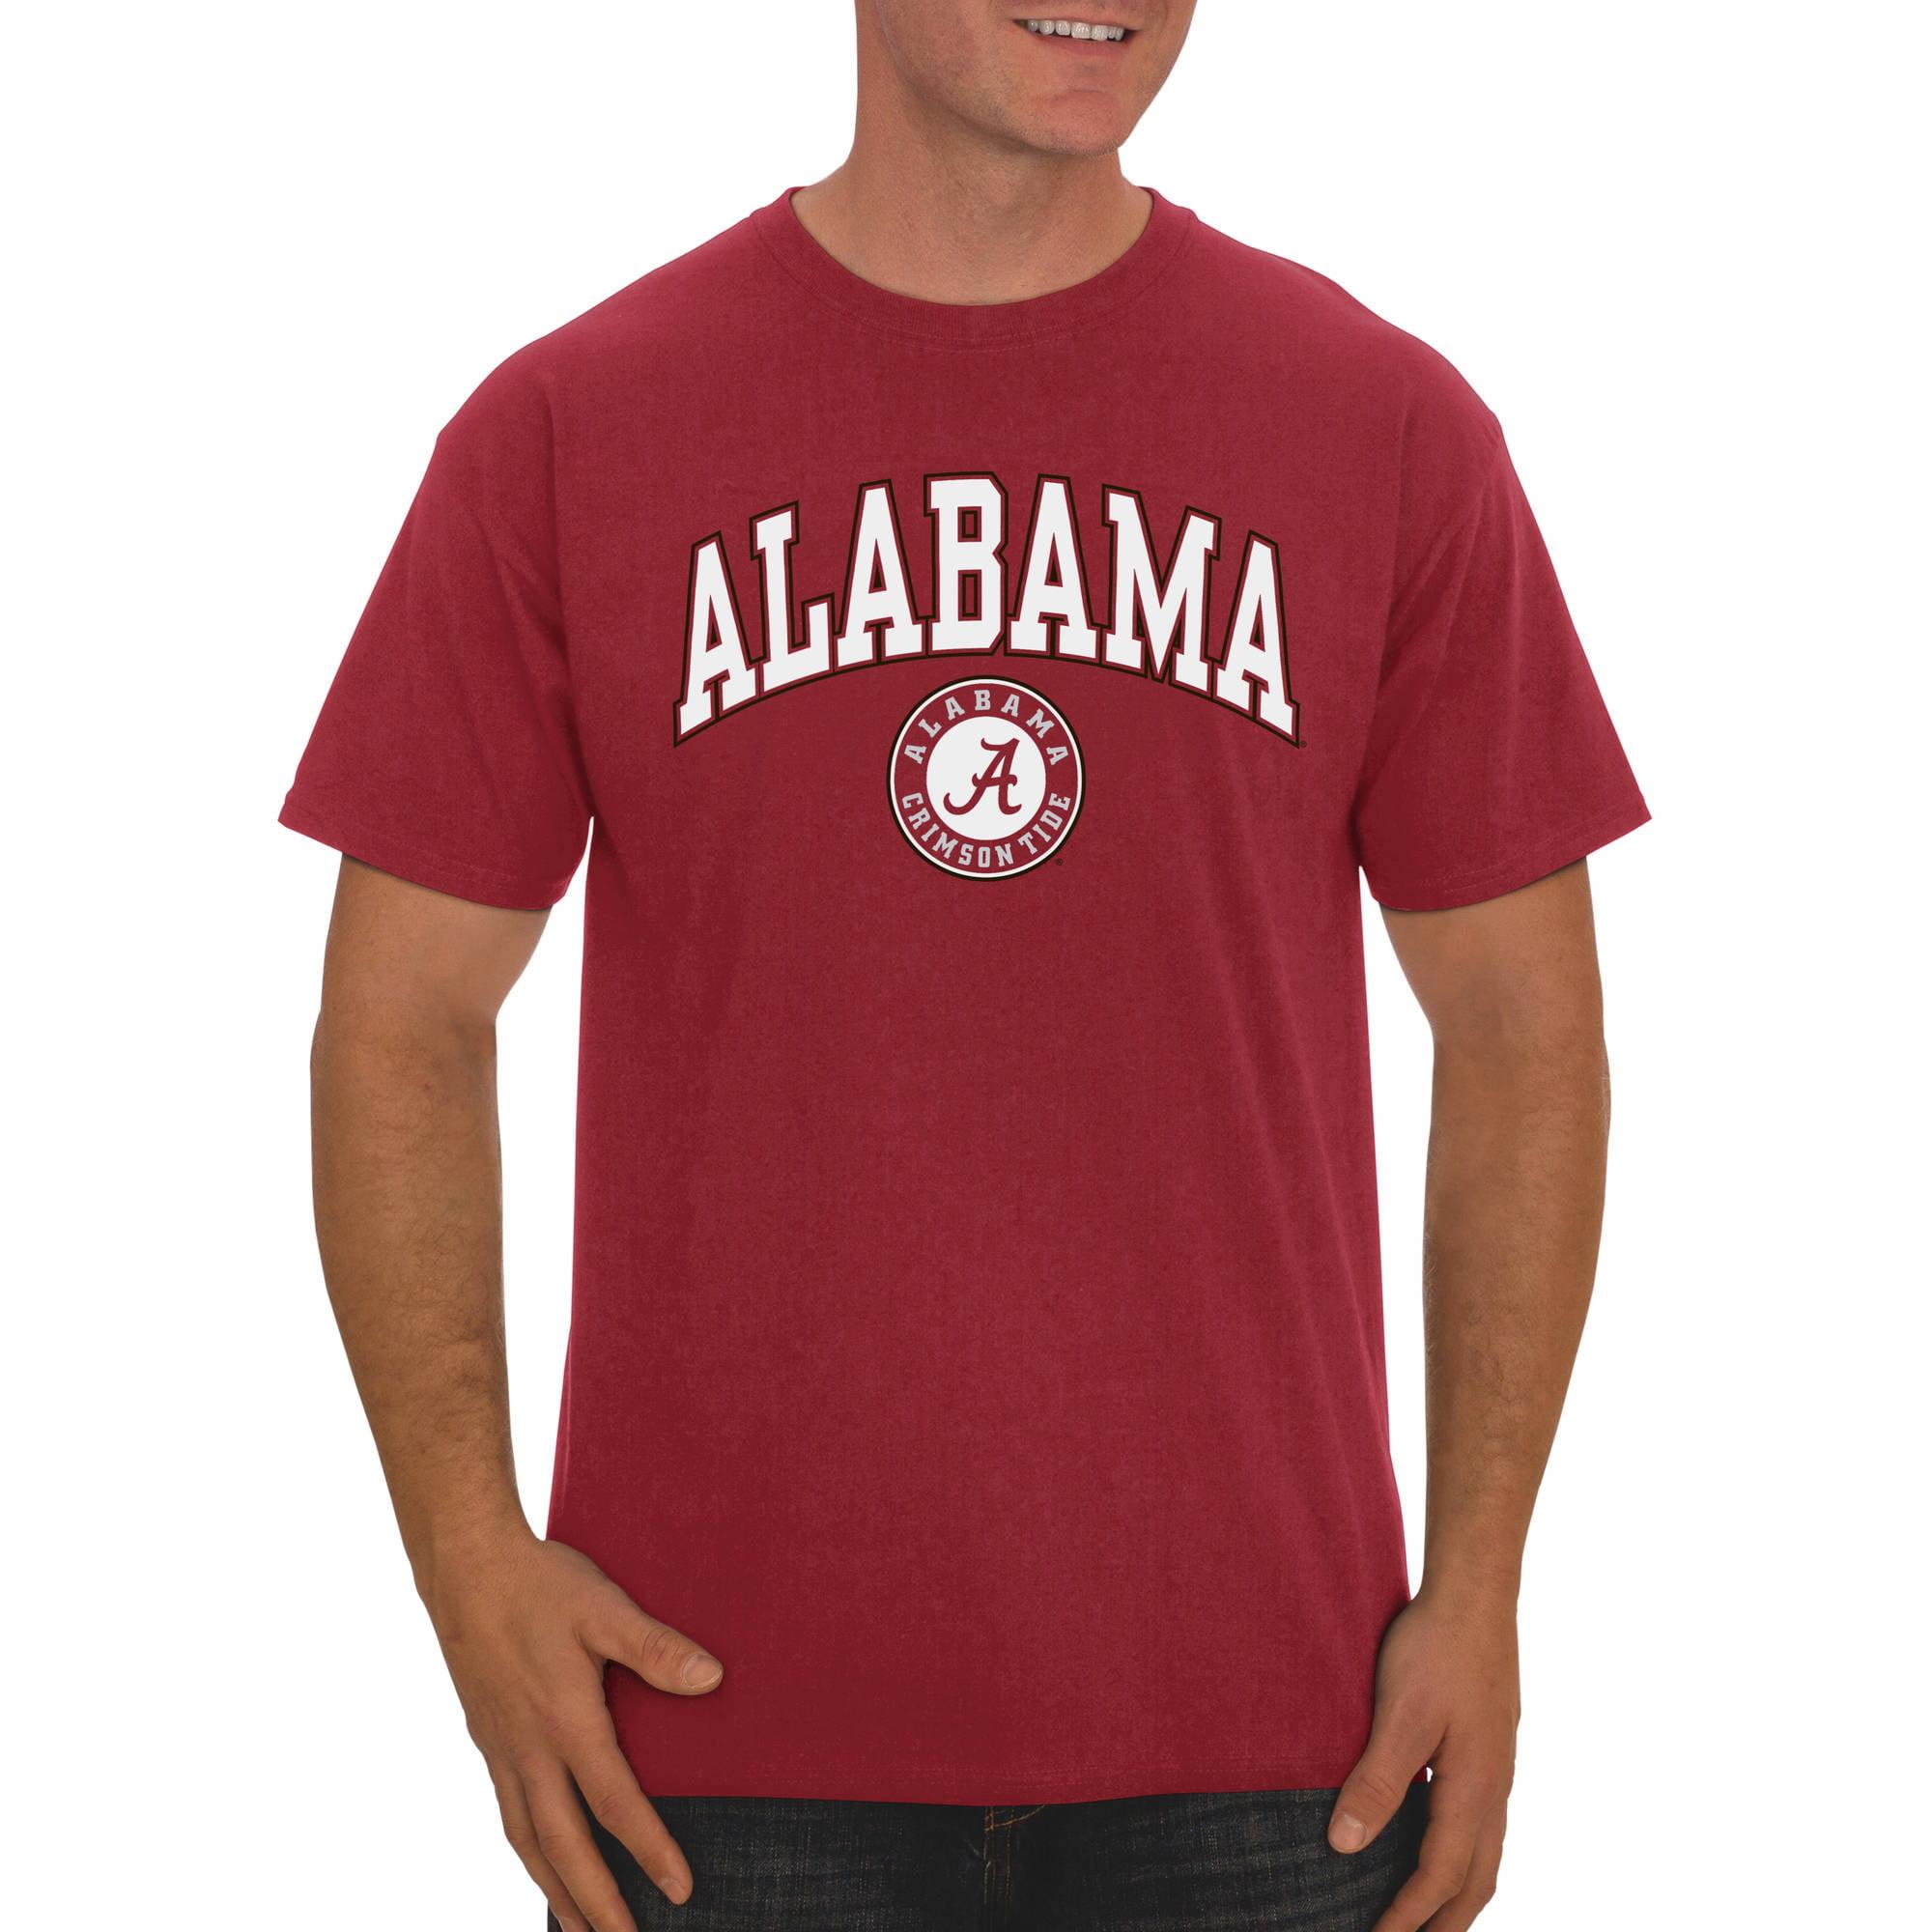 info for 6e9f0 97476 Russell NCAA Alabama Crimson Tide, Men's Classic Cotton T-Shirt